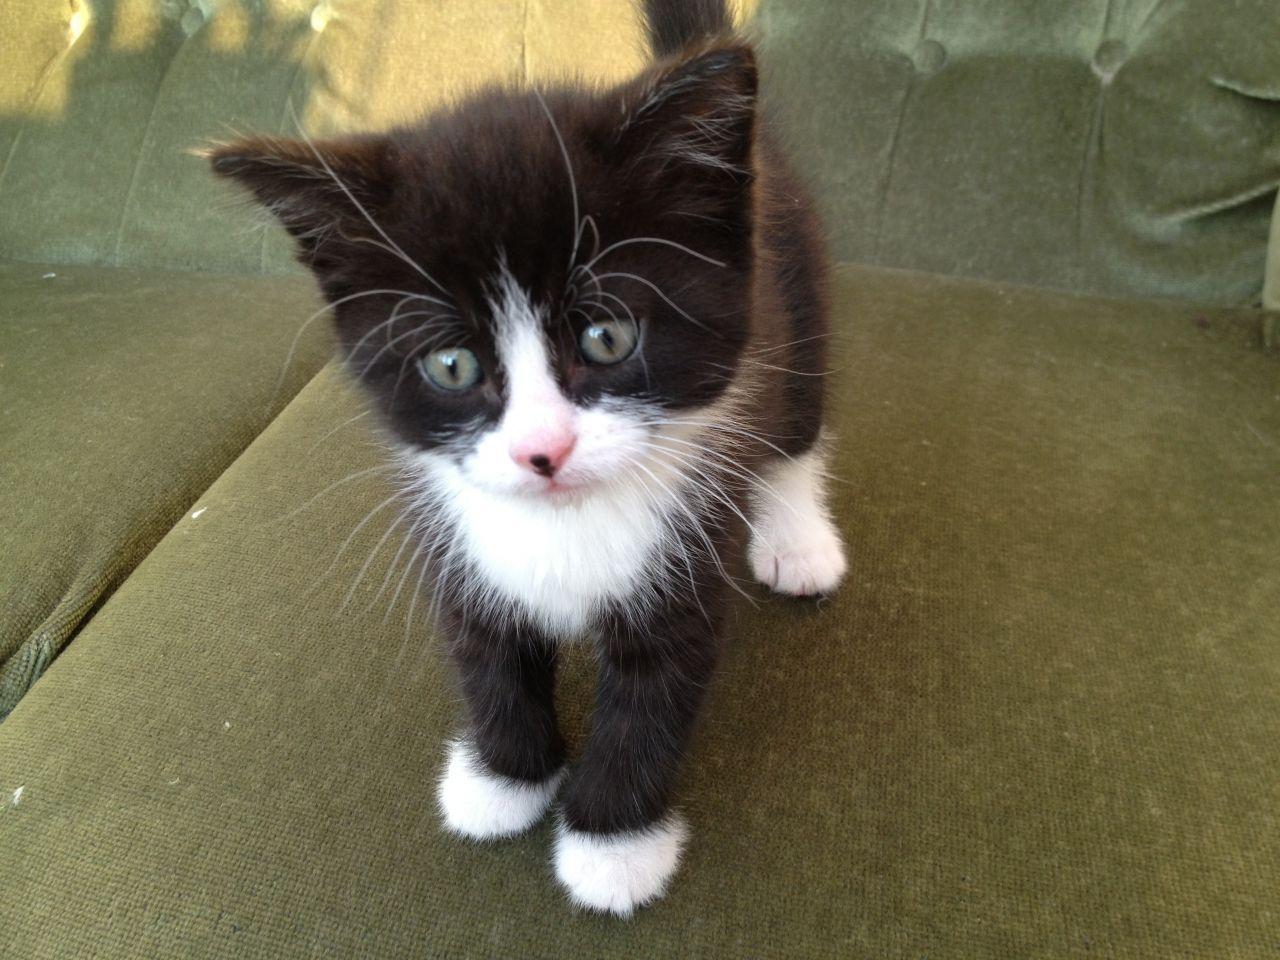 Little Kitten For Sale London South West London Pets4homes Kittens Cutest Baby Cutest Kittens Ever Kitten Pictures